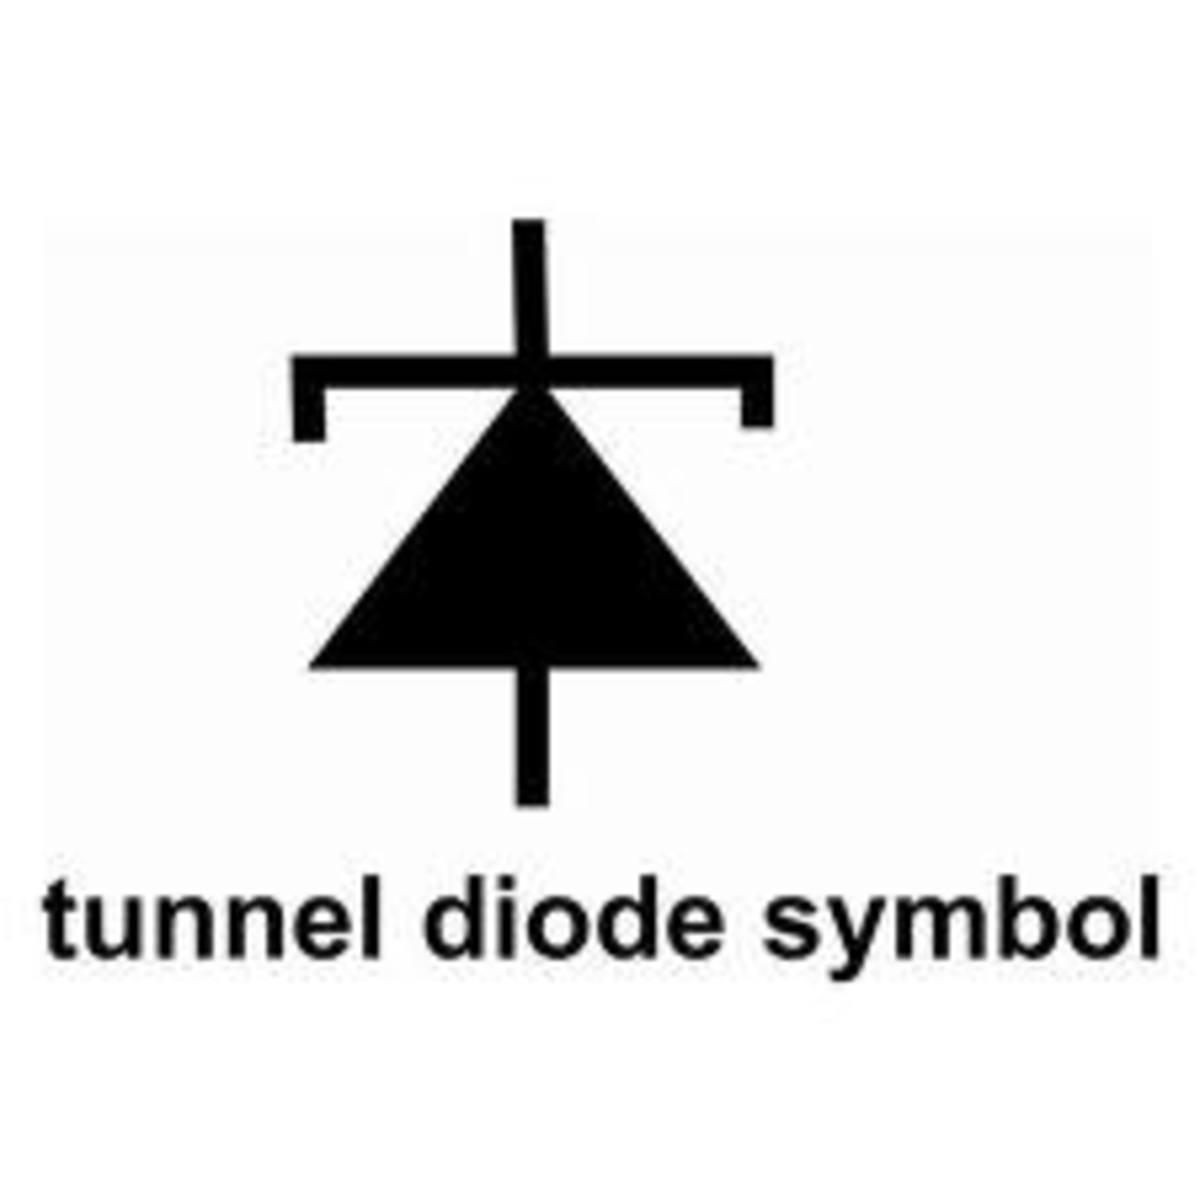 Diodes Physics Gcse Coursework - image 10